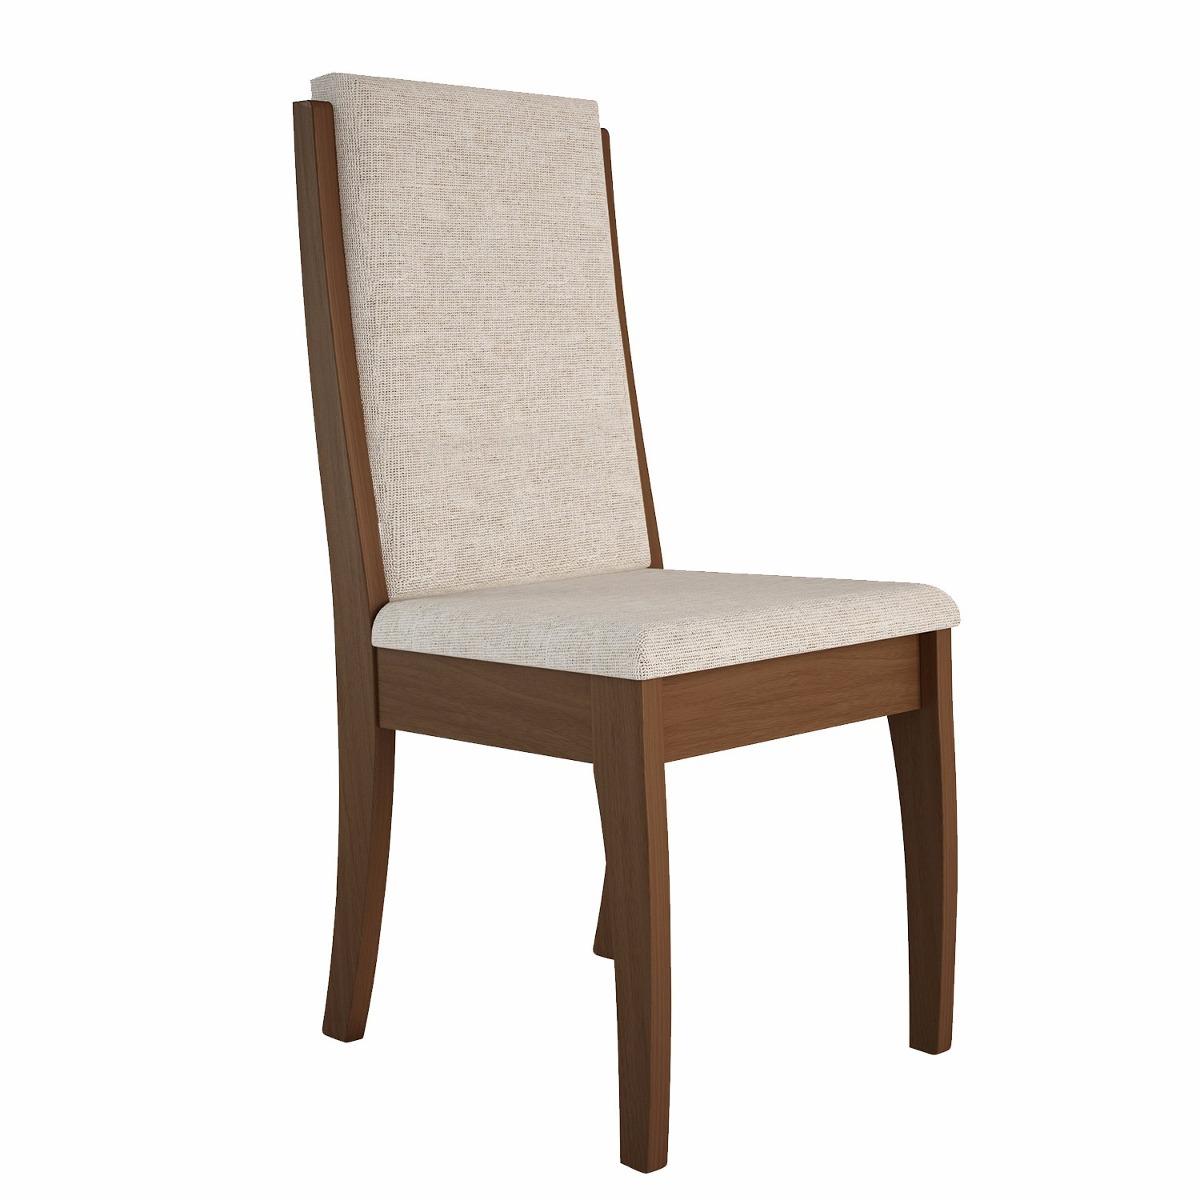 Sillas tapizadas para comedor excellent sillas tapizadas for Sillas de comedor de madera tapizadas